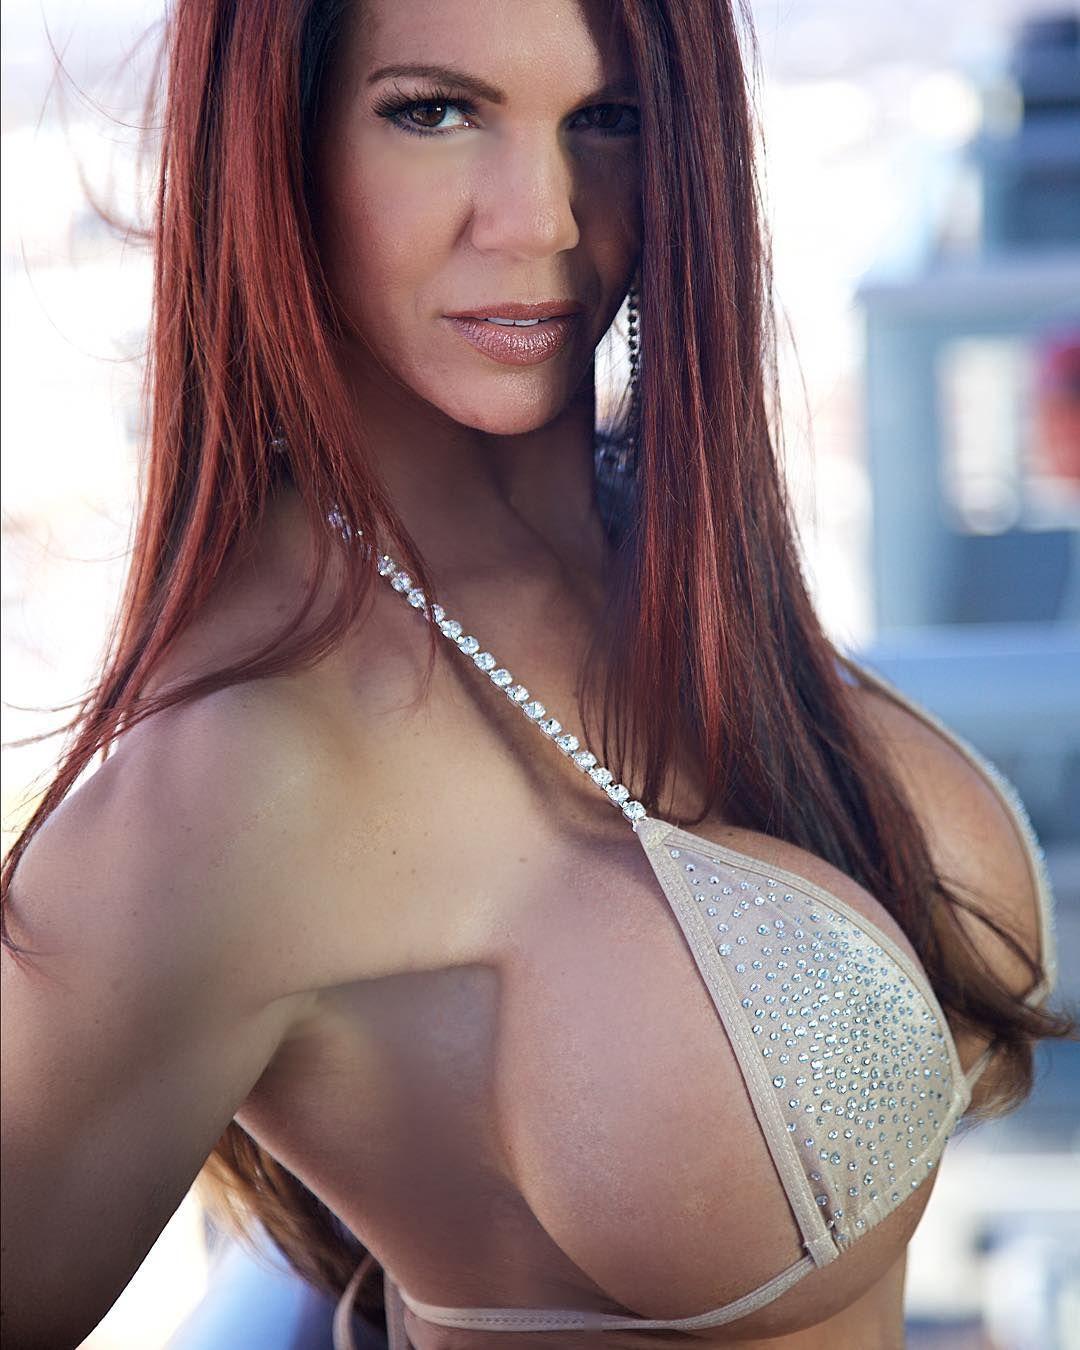 huge tits gifs - big boobs pics - schandevongijon: linda steele